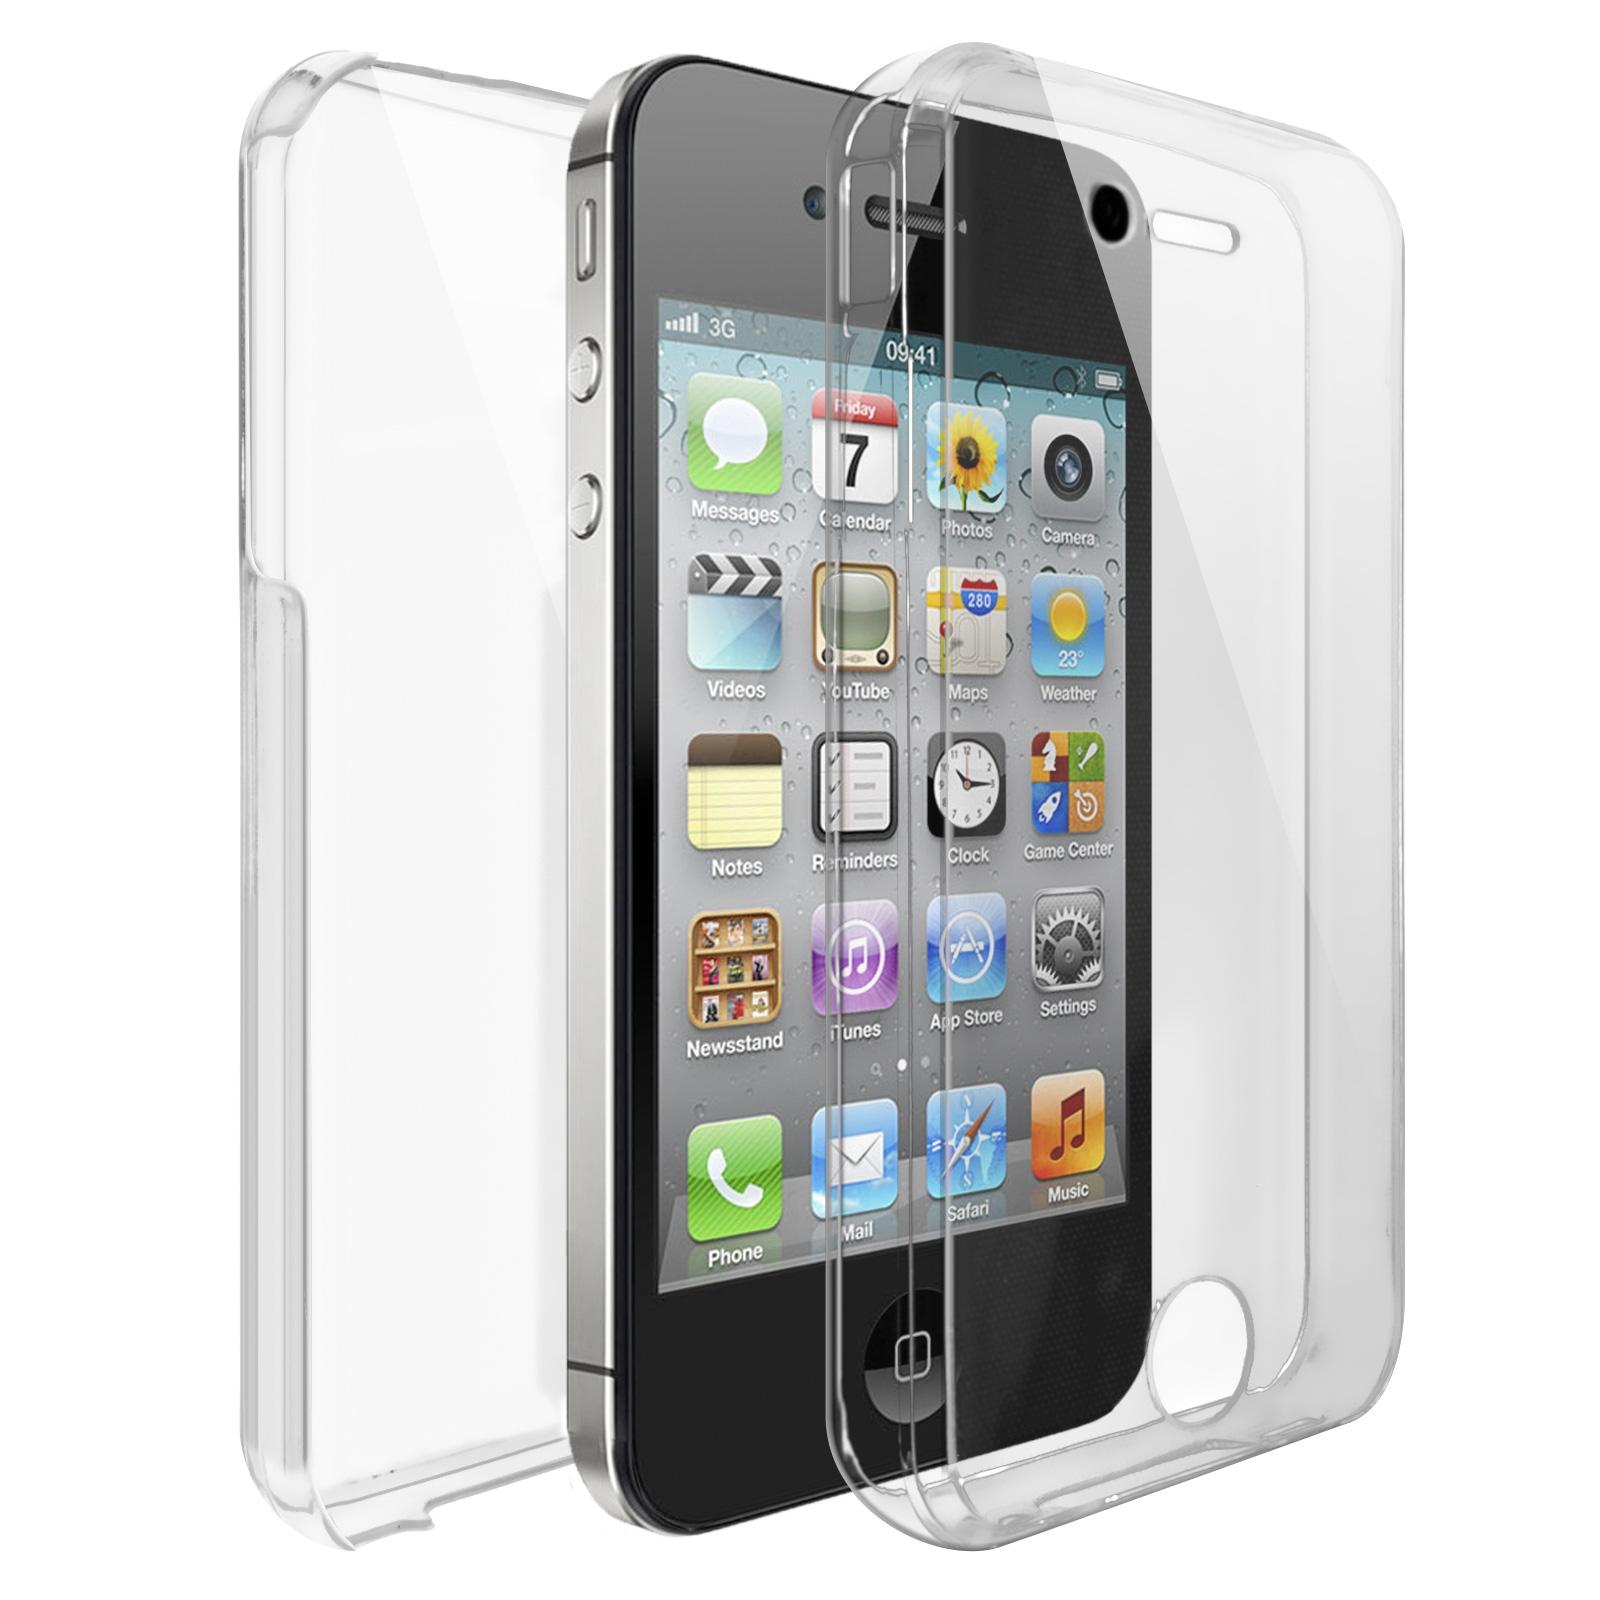 coque apple iphone 4 4s x doria defense 360 transparente. Black Bedroom Furniture Sets. Home Design Ideas